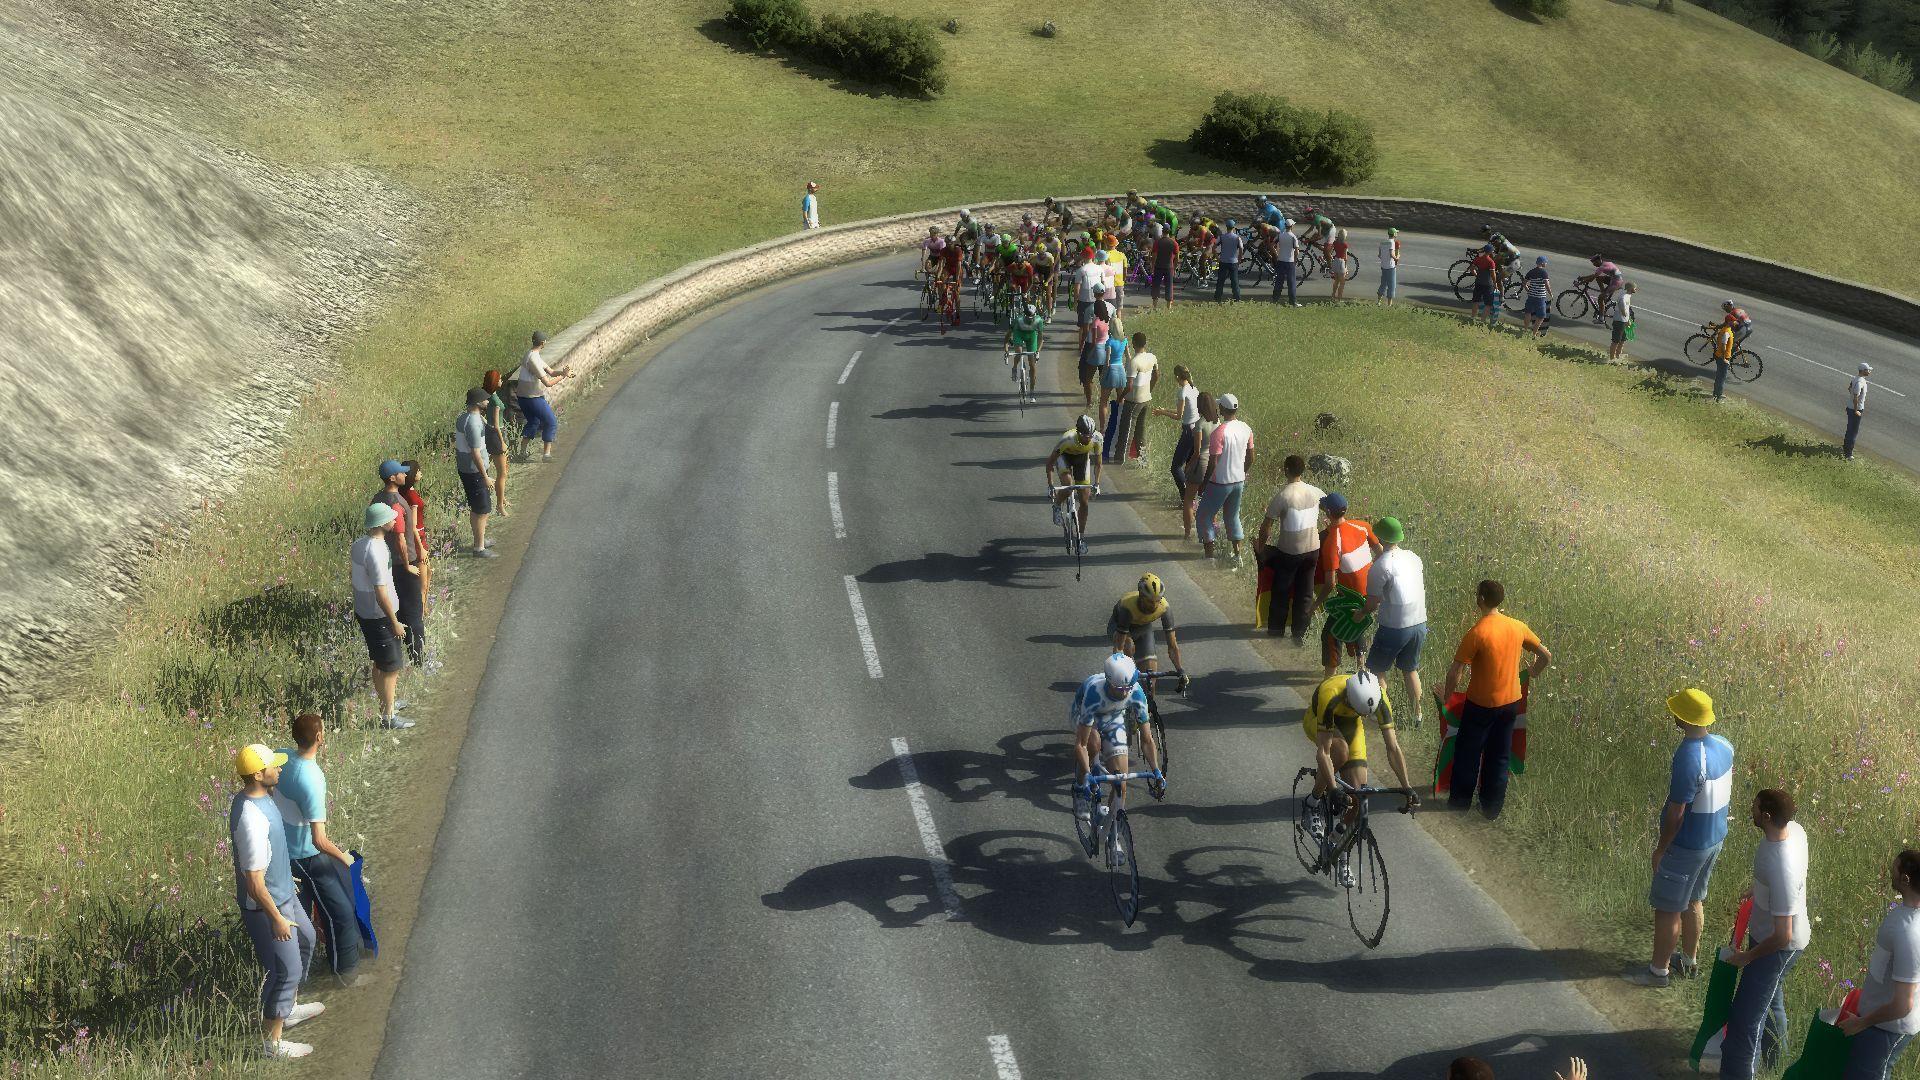 pcmdaily.com/images/mg/2017/Races/U23/Avenir/AVES7%2019.jpg